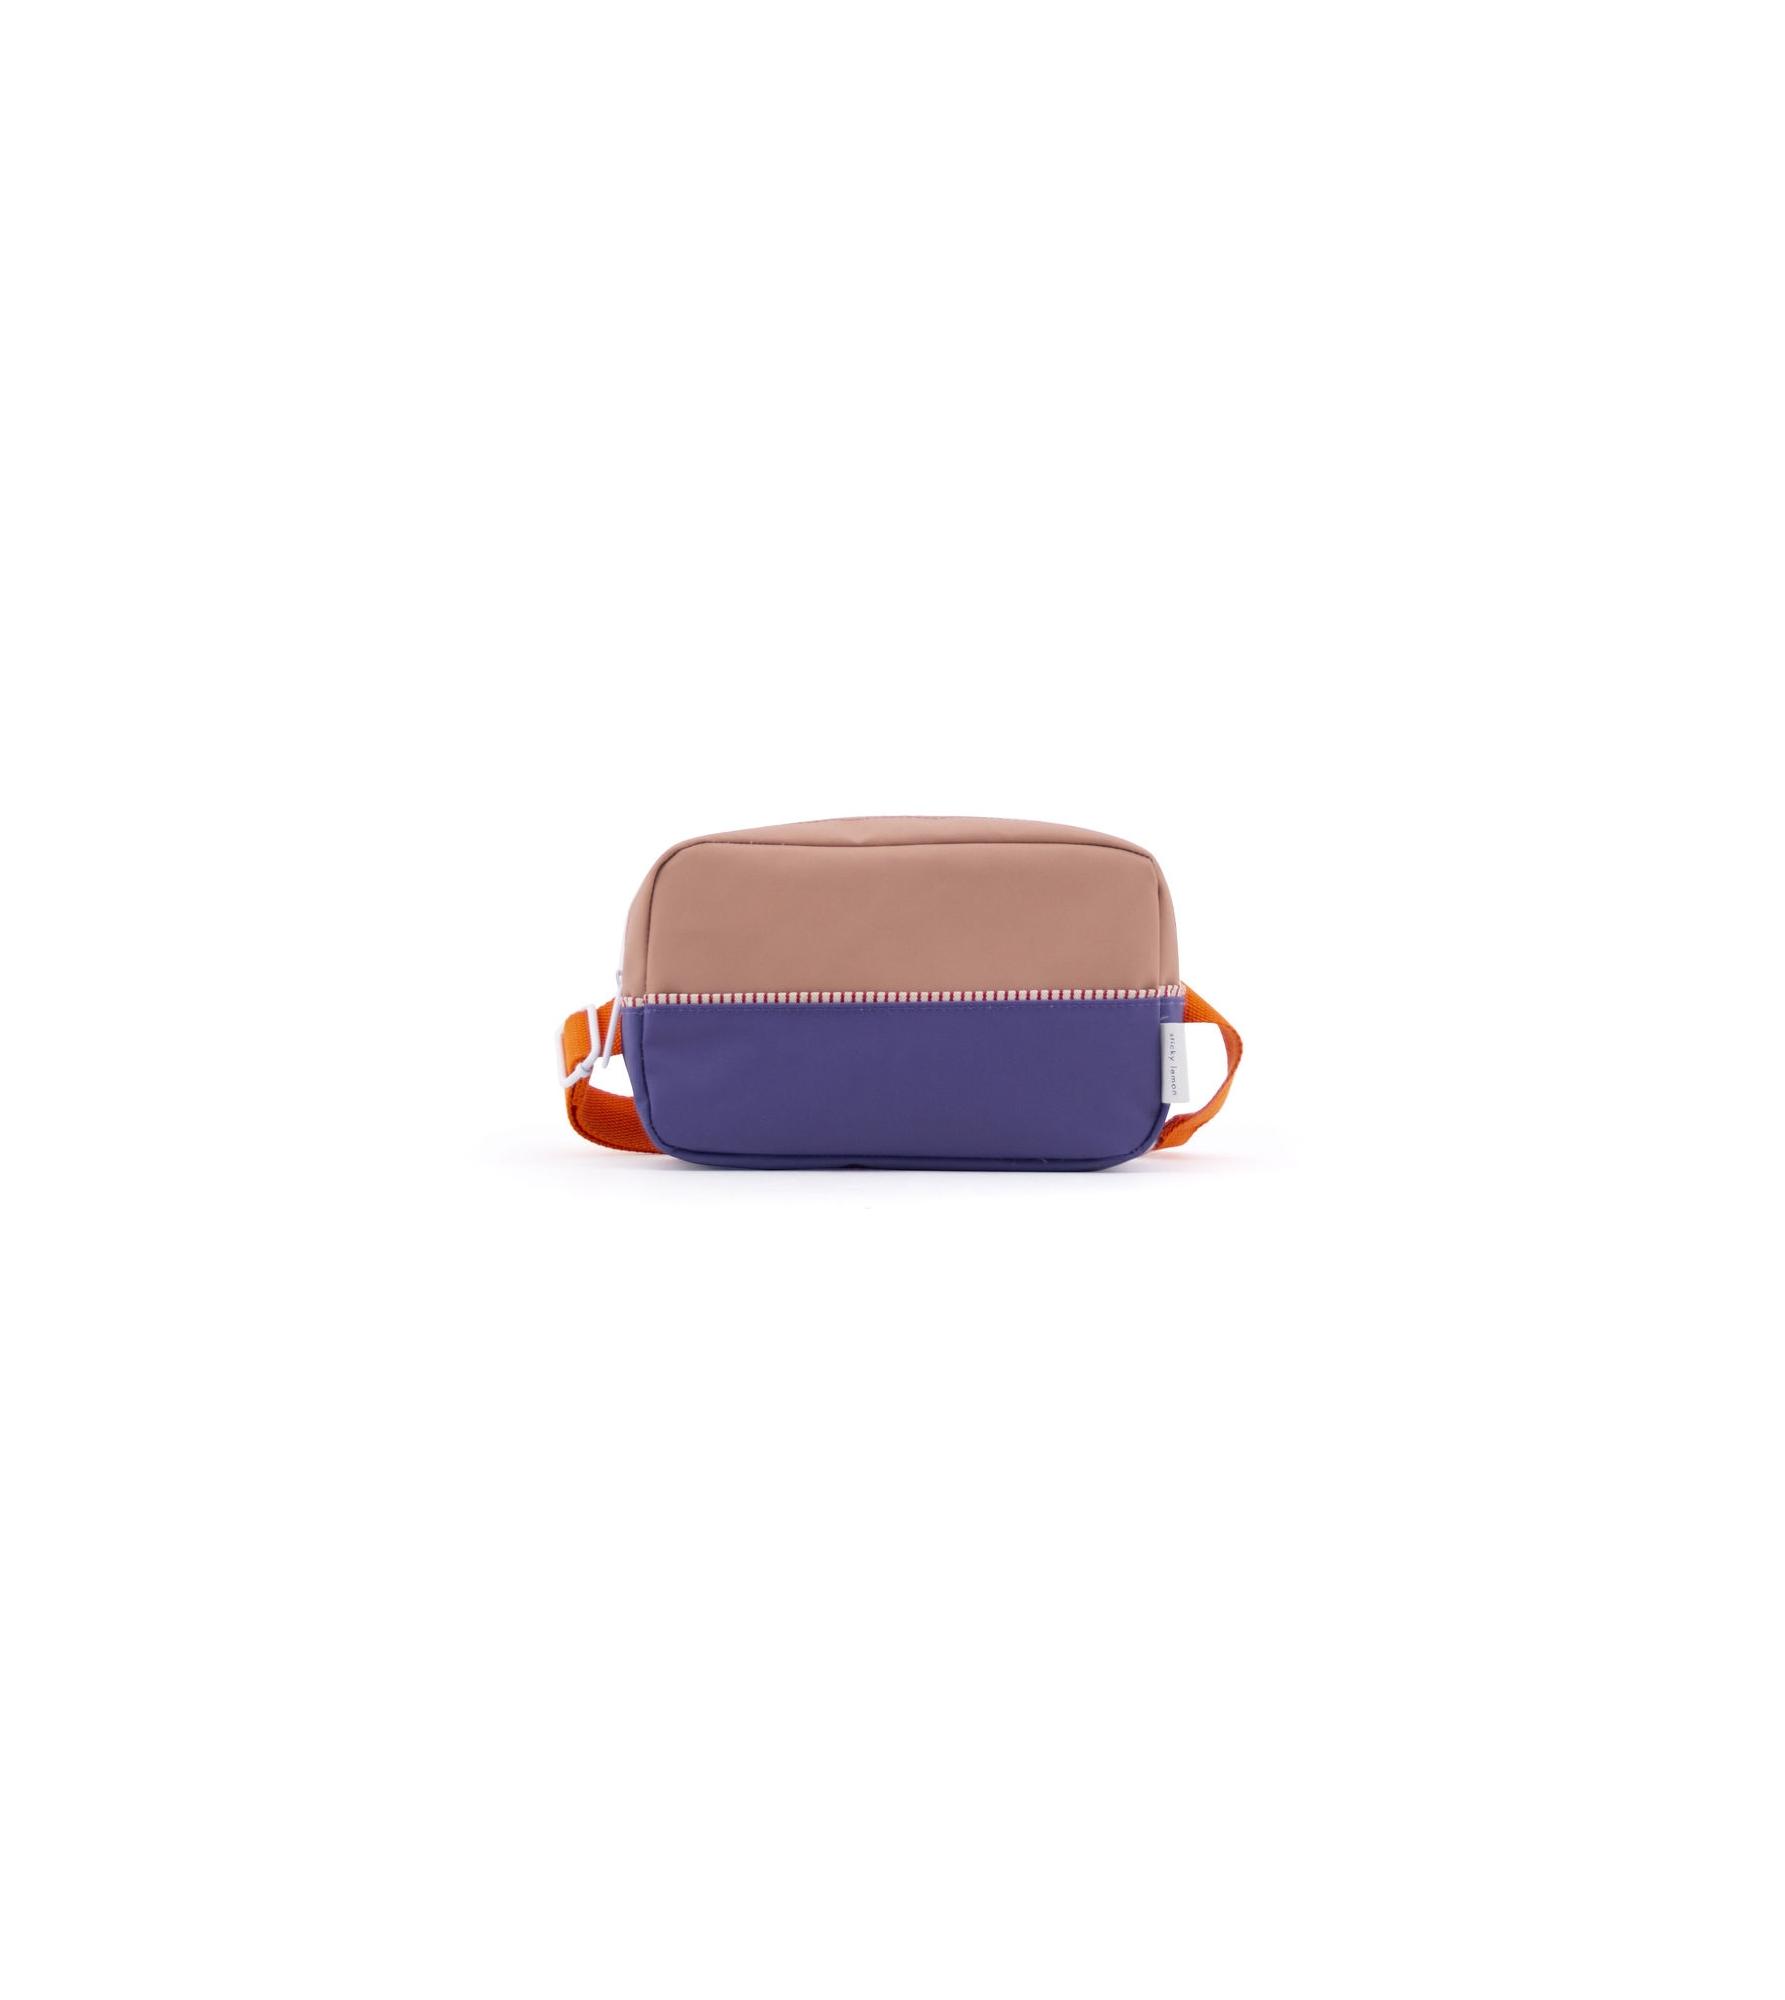 1801404 - Sticky Lemon - fanny pack large - colour blocking - chocolat au lait _ lobby purple _ .jpg